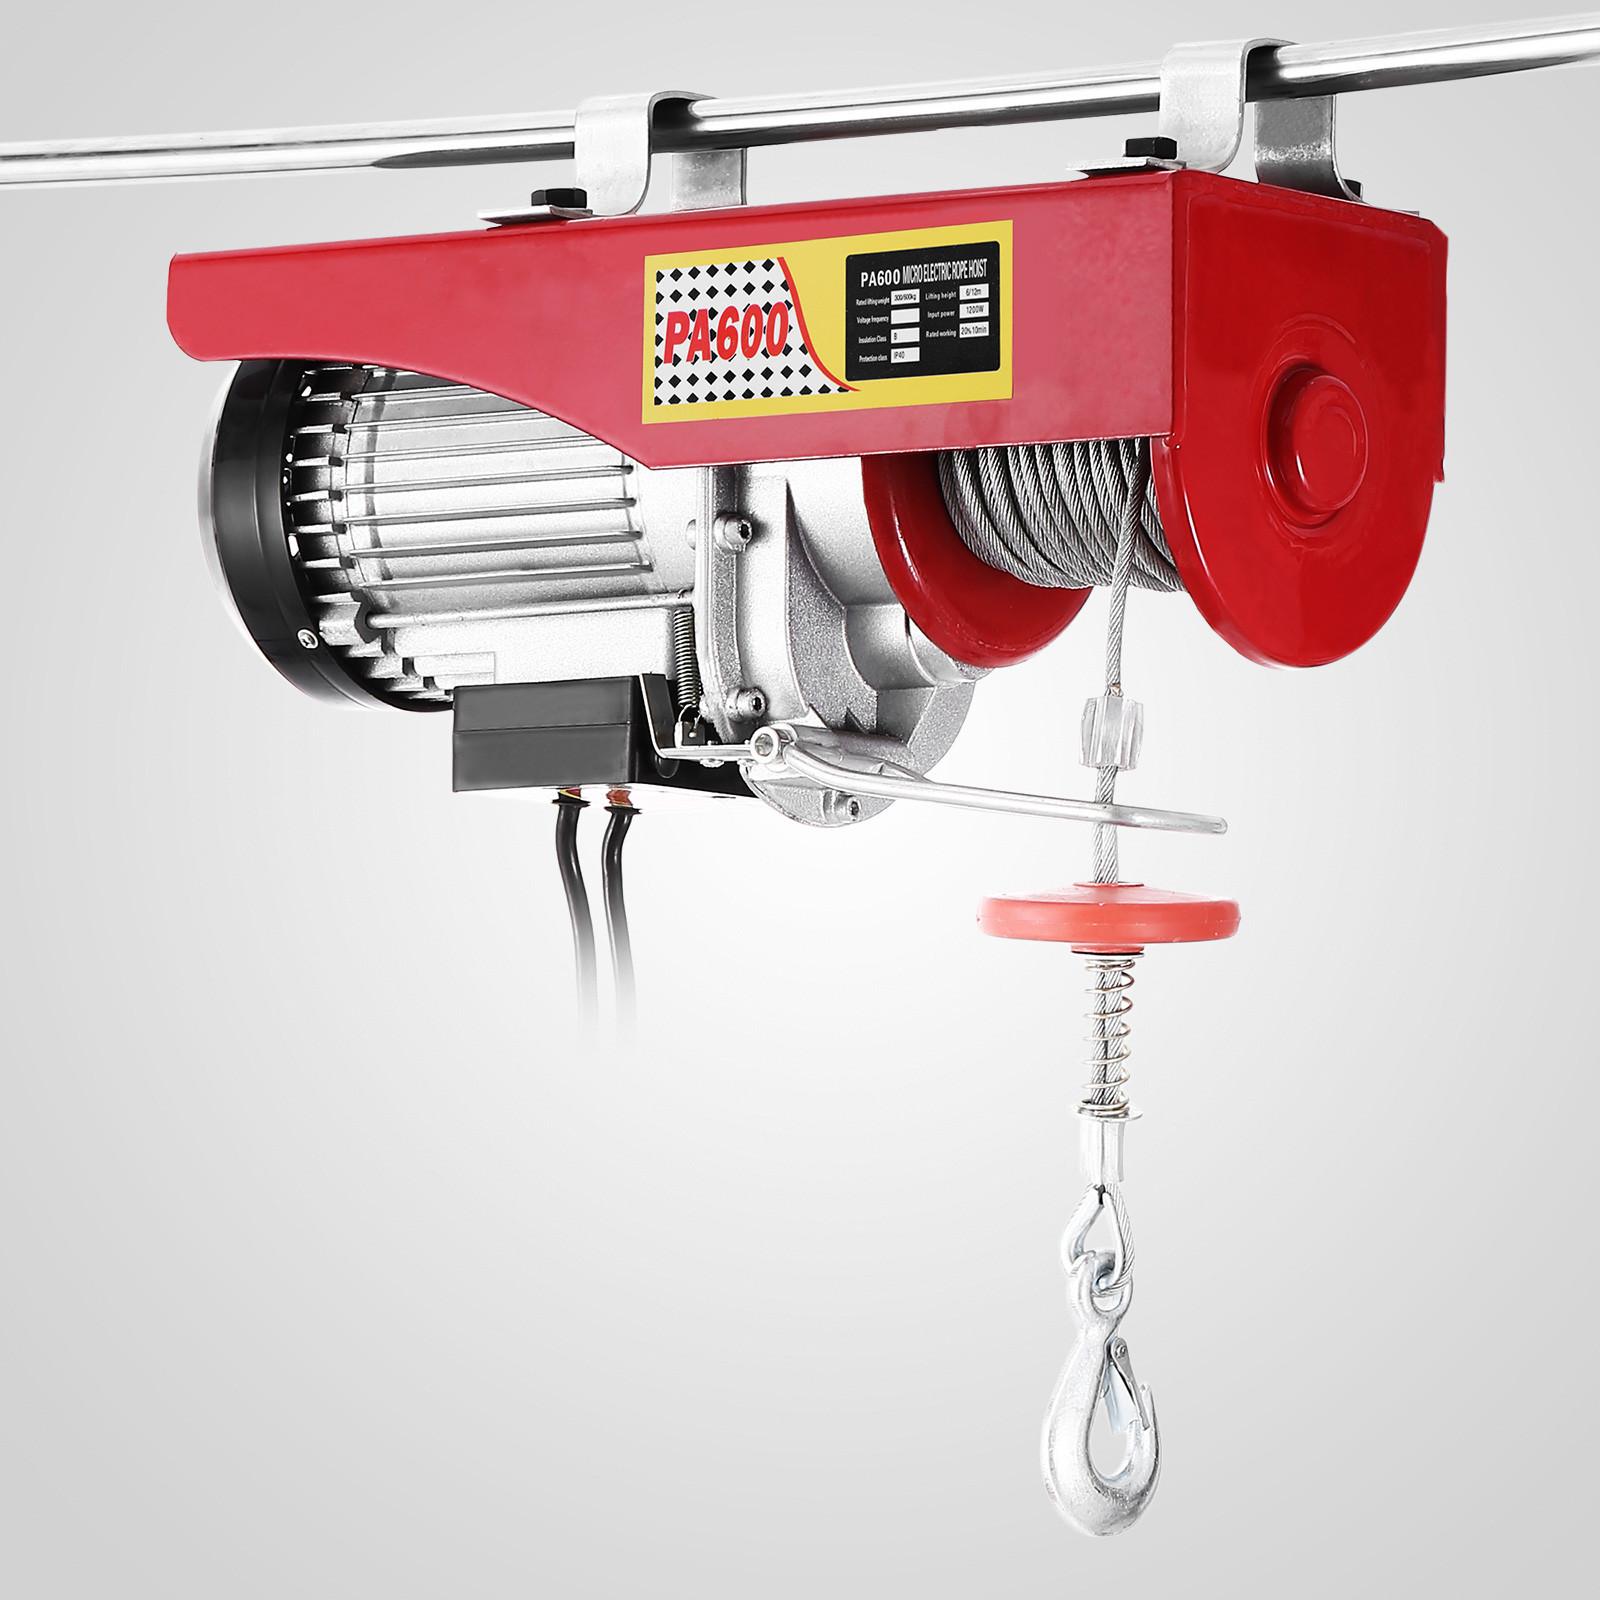 100kg-900kg-Electric-Hoist-Winch-Lifting-Engine-Crane-Cable-Lift-Hook-Garage miniature 39